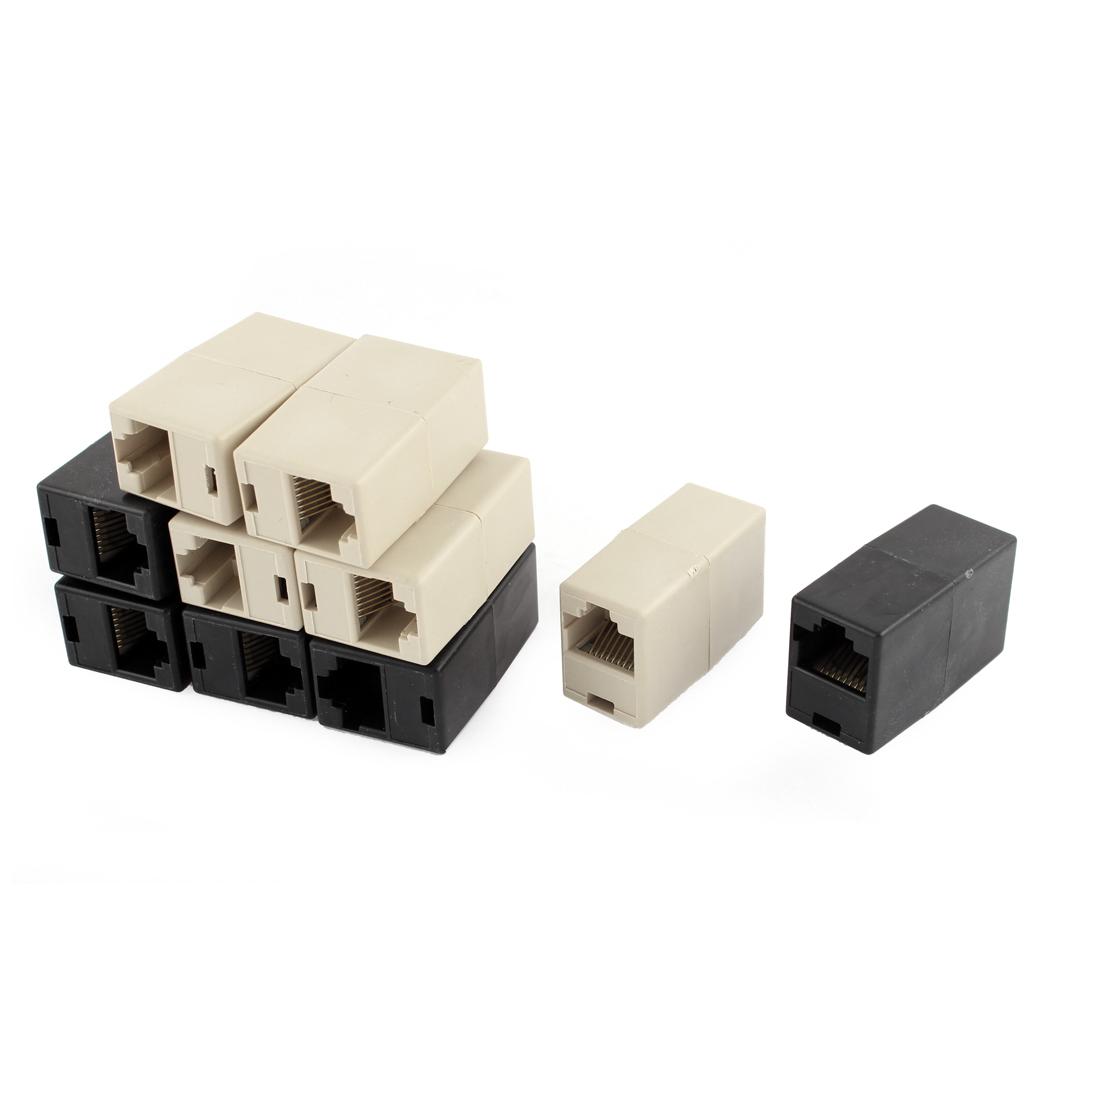 Cat5 RJ45 Lan Network Ethernet Cable Joiner Adapter Coupler Black Khaki 10 PCS